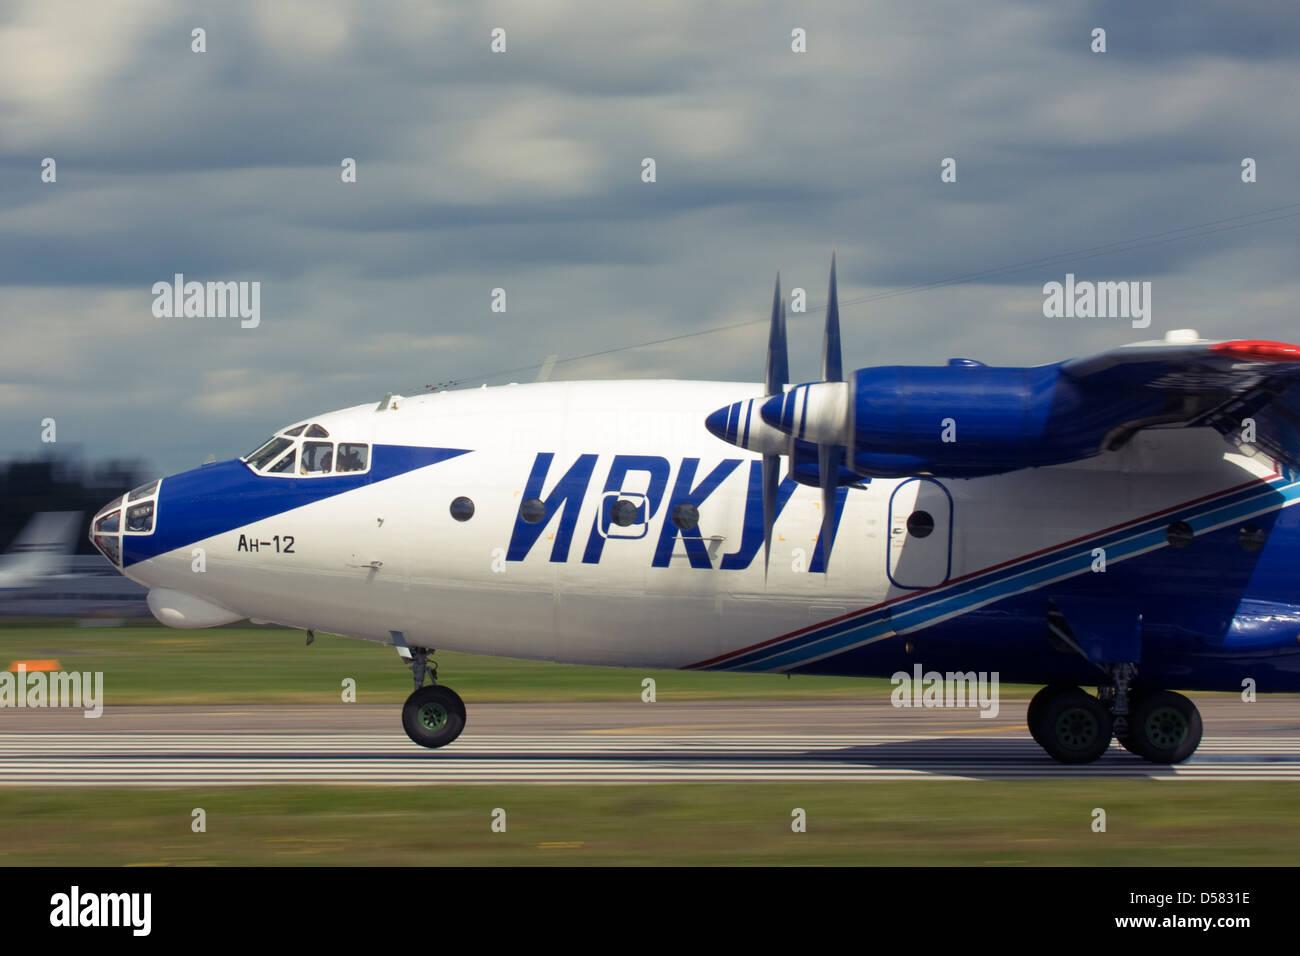 Gromov Air (Irkut-Avia) Antonov An-12 touching down on runway at Farnborough International Airshow 2012 - Stock Image